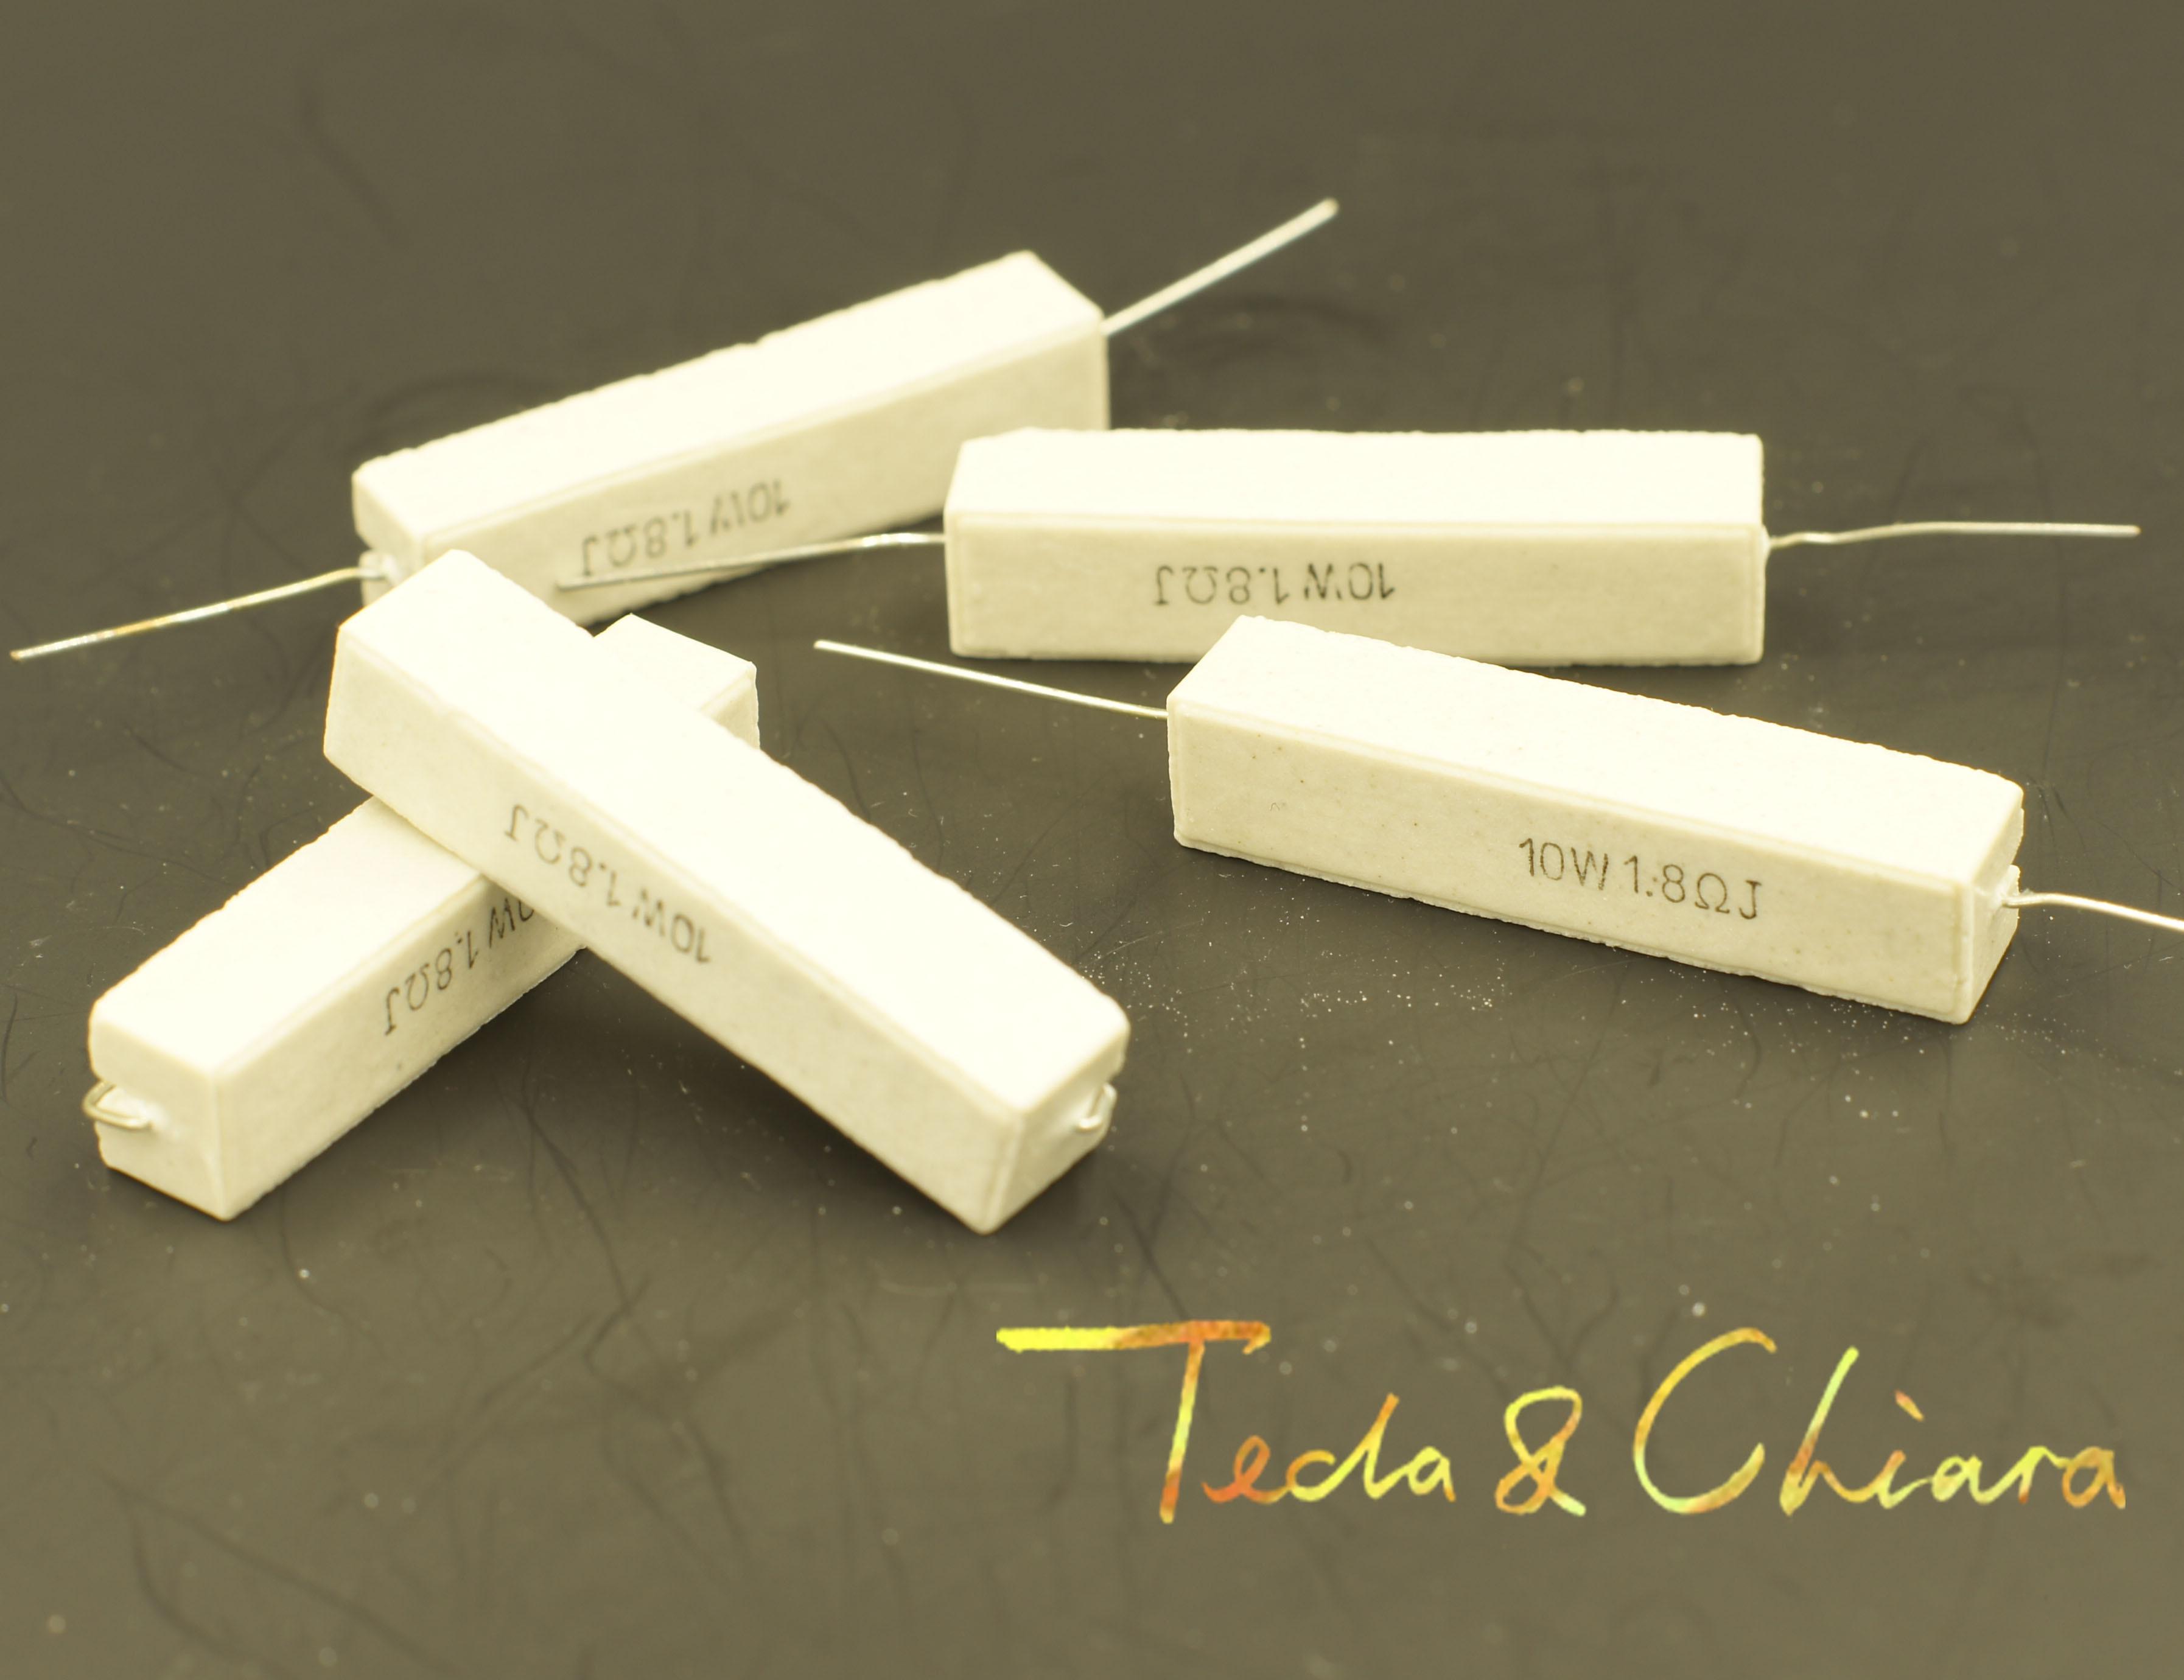 10Pcs 10W 47R 51R 56R 62R 47ohm 51ohm 56ohm 62ohm 47 51 56 62 5% Cement Ceramic Power Horizontal Resistor Resistance R Ohm fixed type pipe resistance 400w 390 ohm ceramic tube resistor